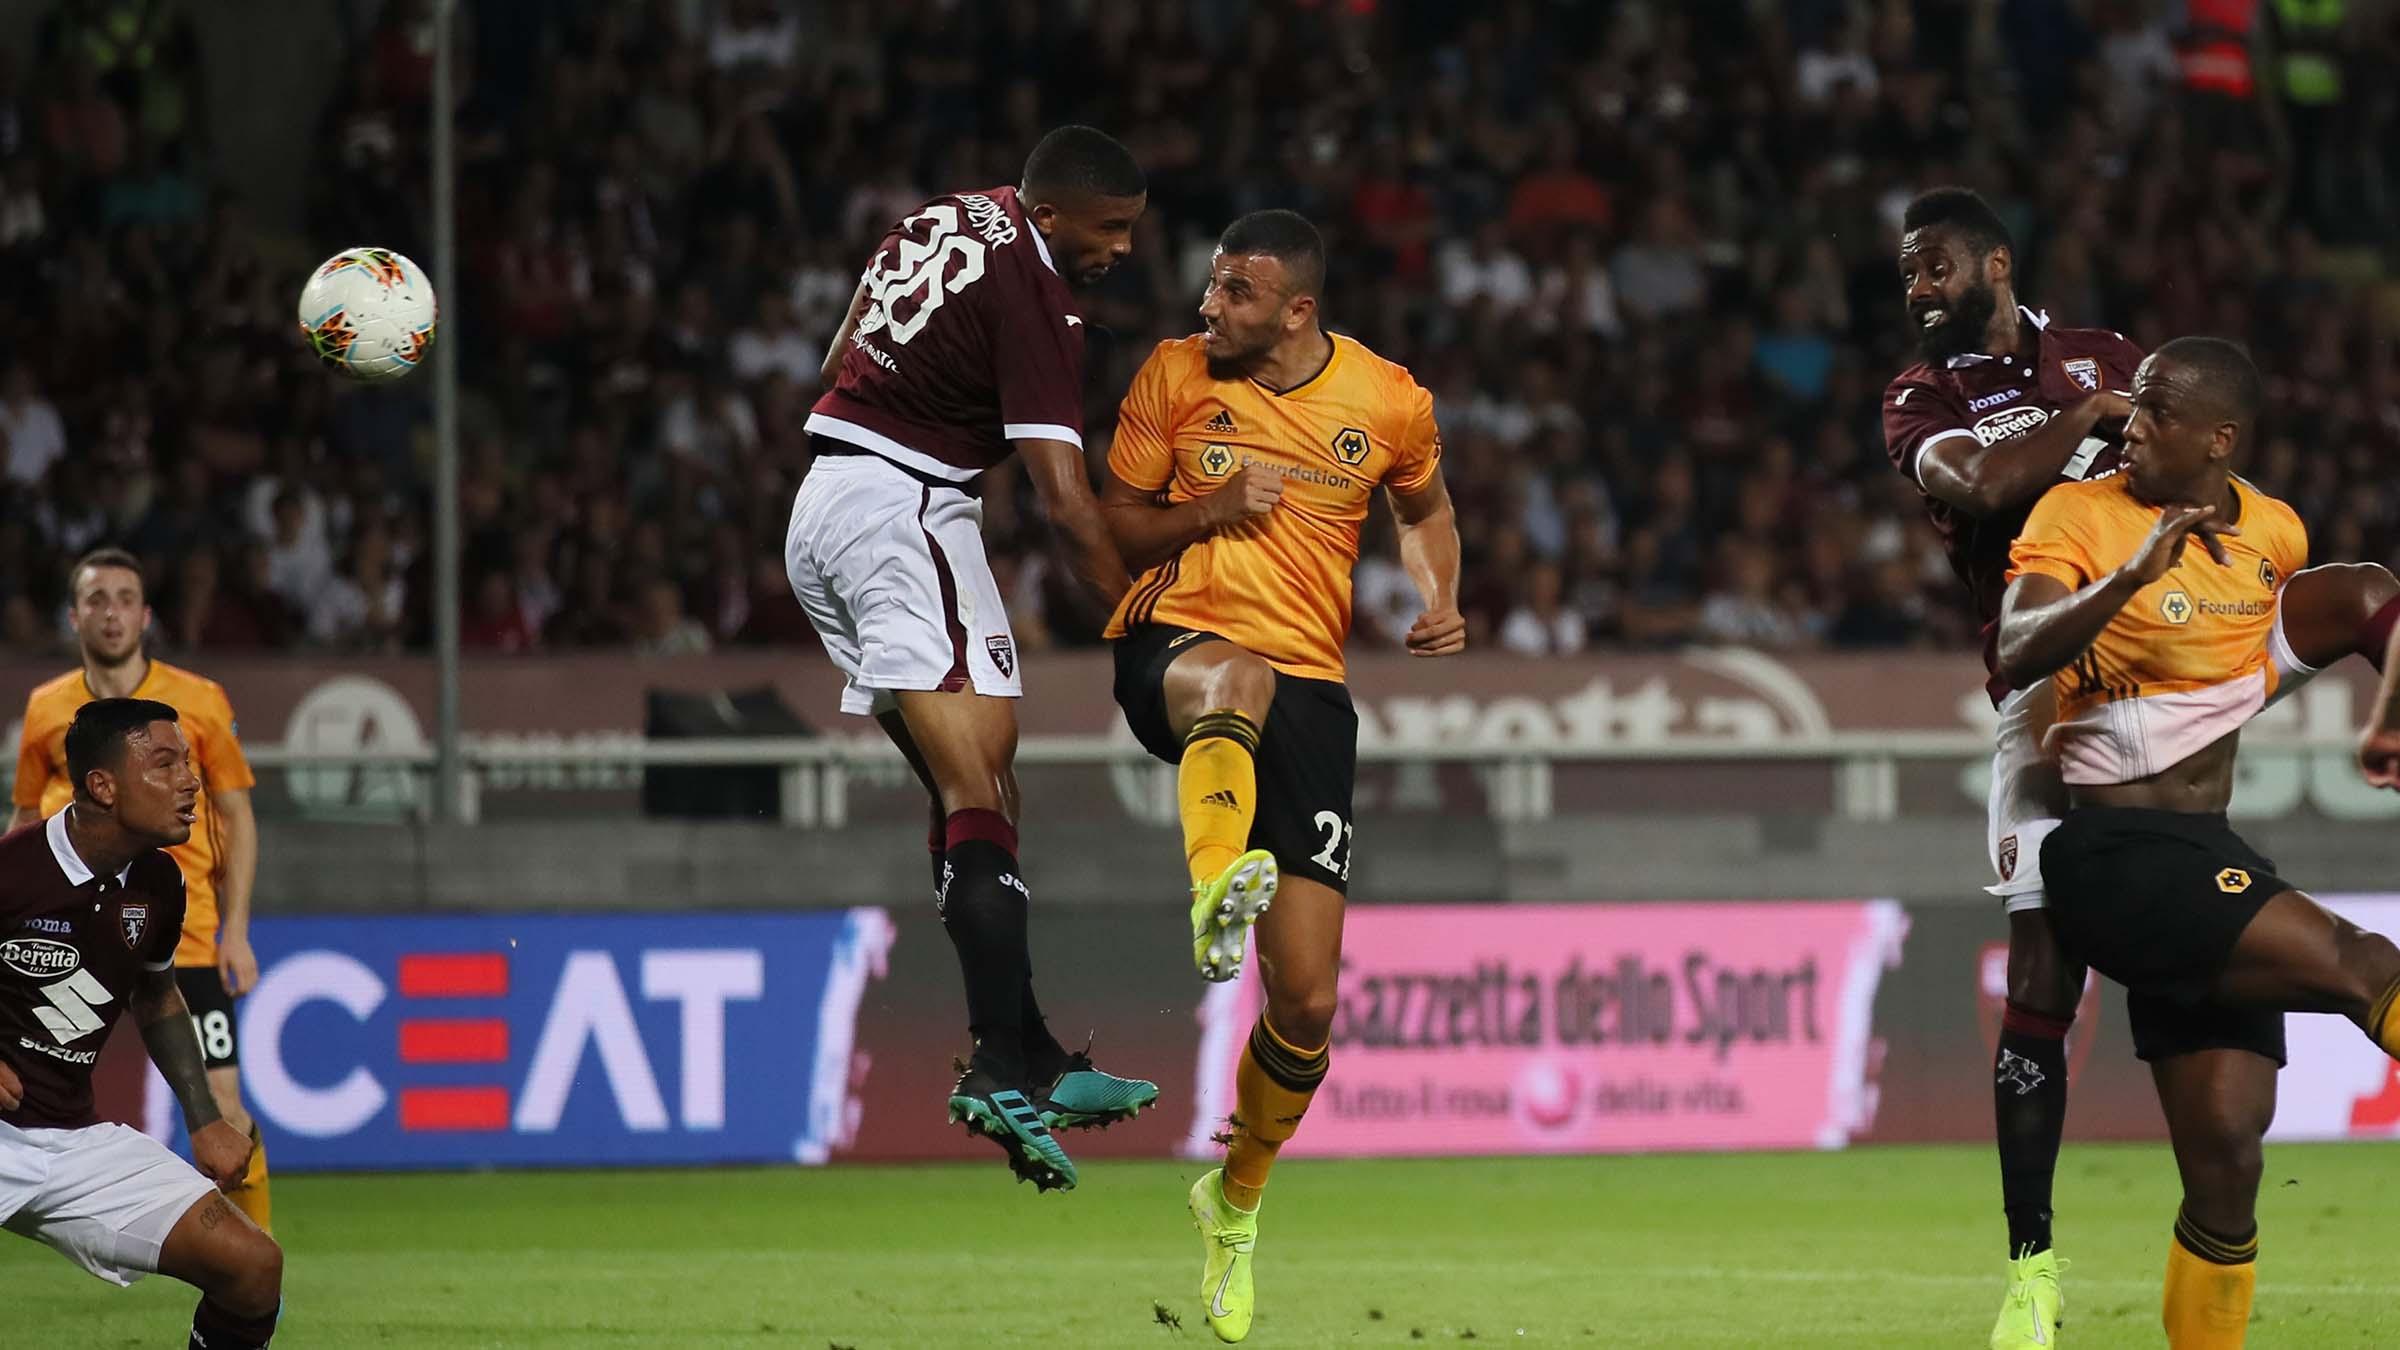 Torino 2-3 Wolves | Match report